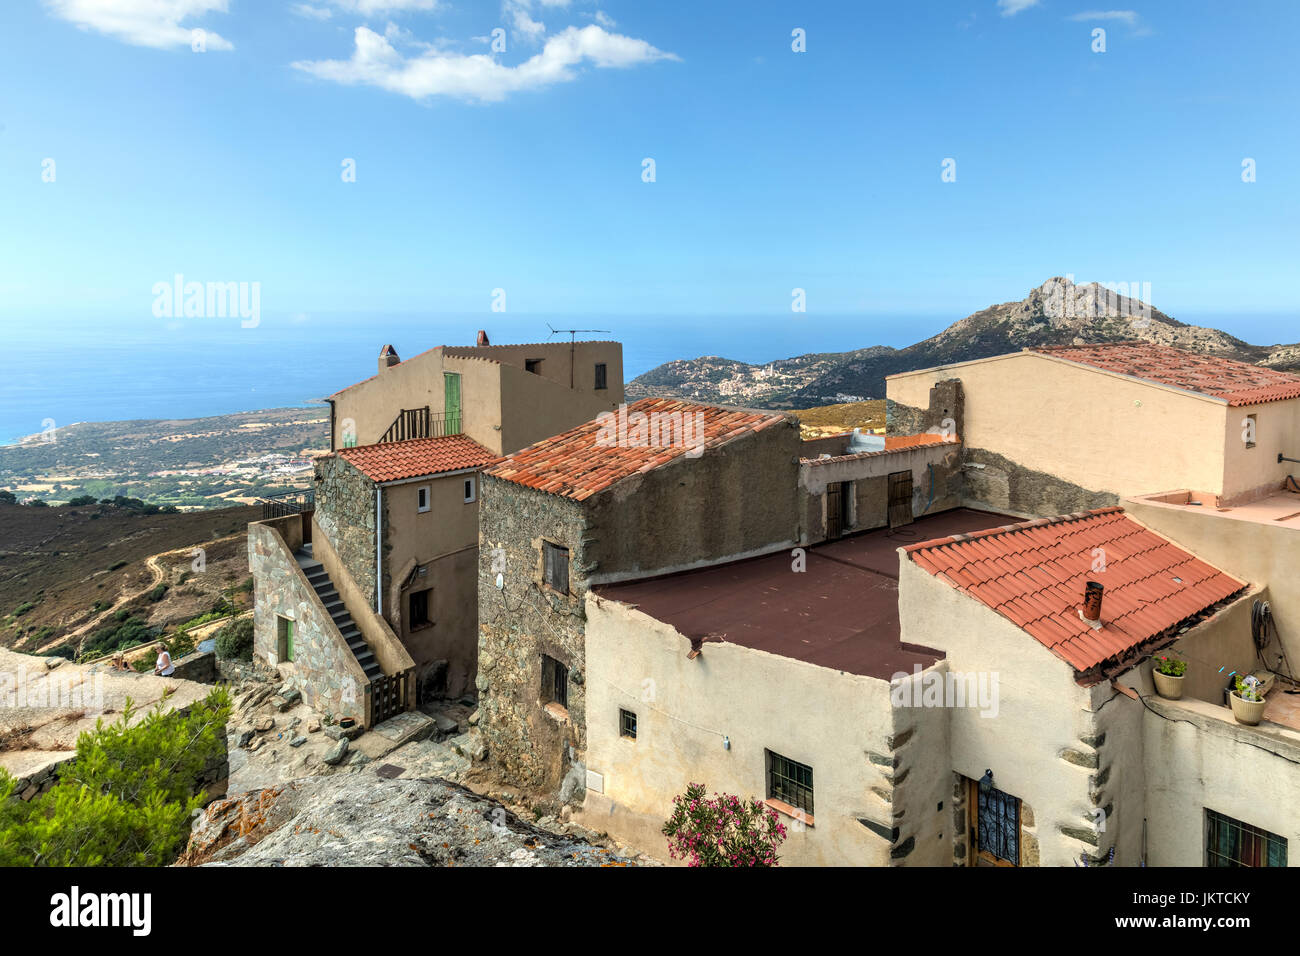 Sant'Antonino, Corsica, France - Stock Image